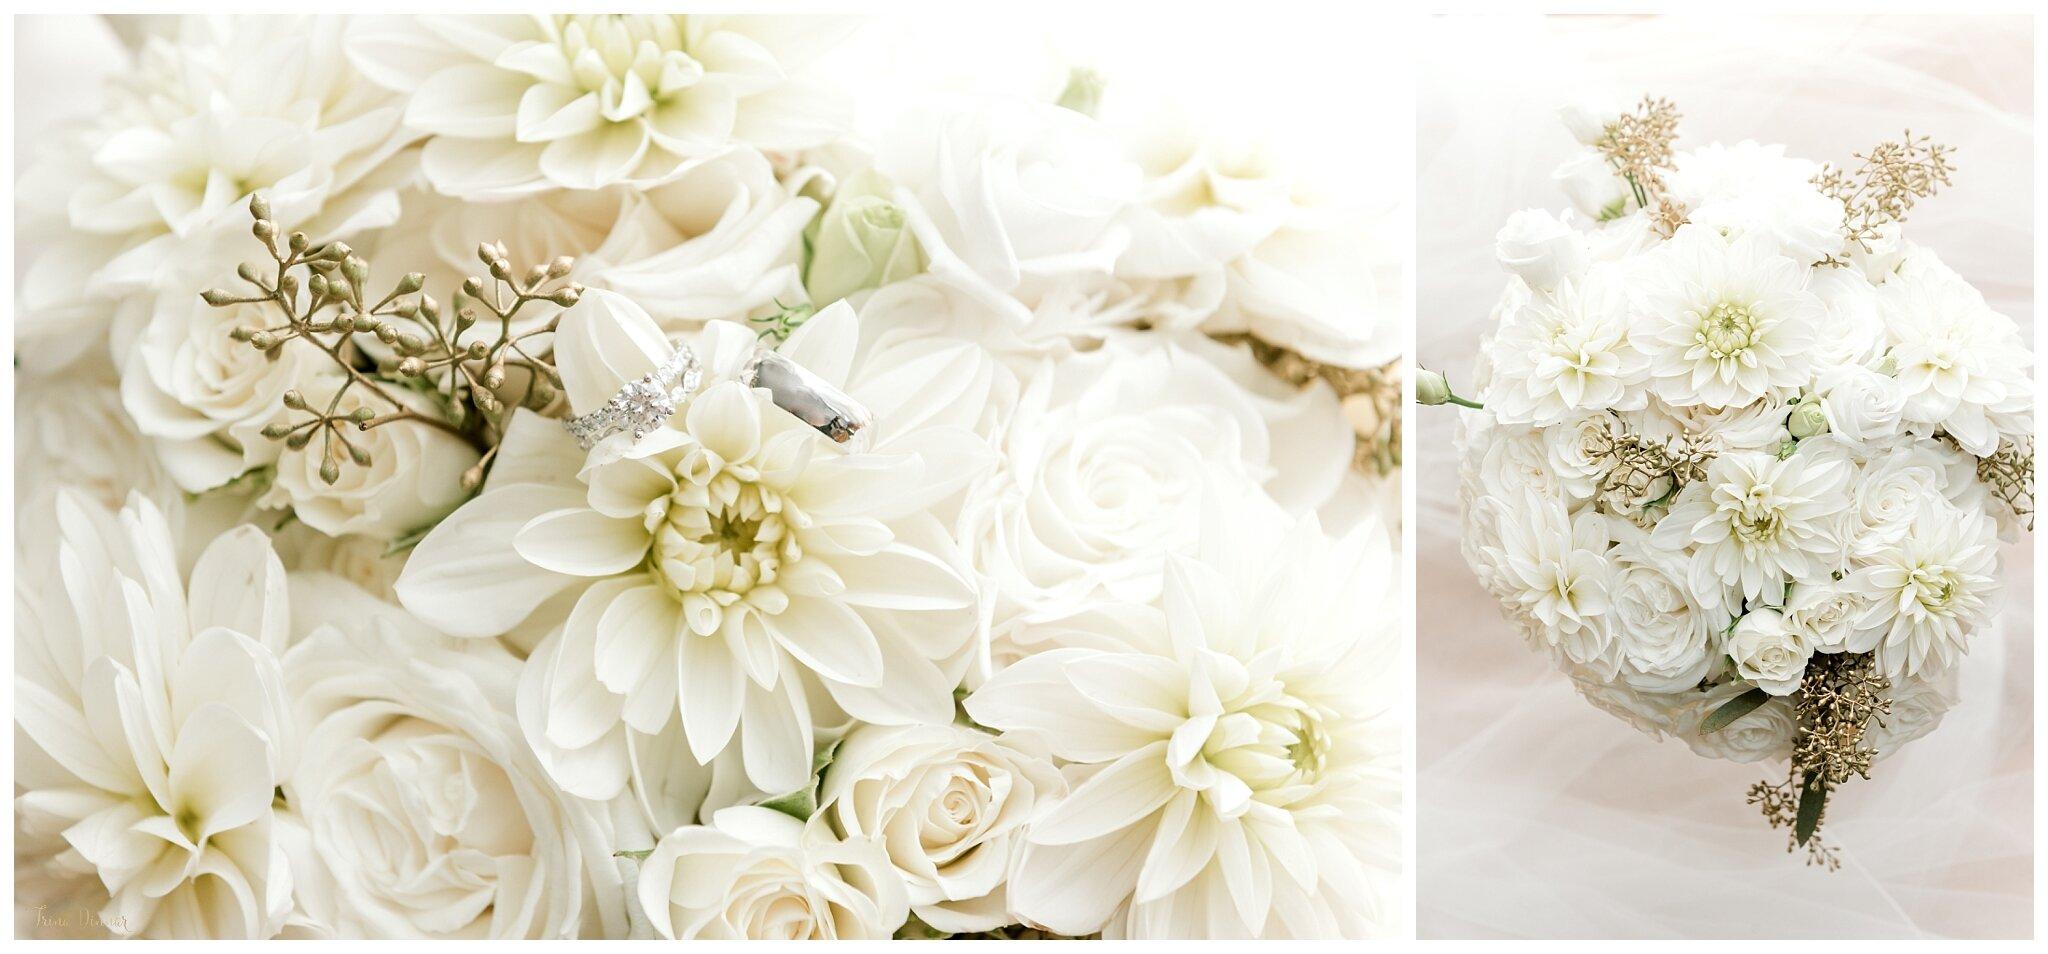 Maine Event Design and Decor Wedding Florist